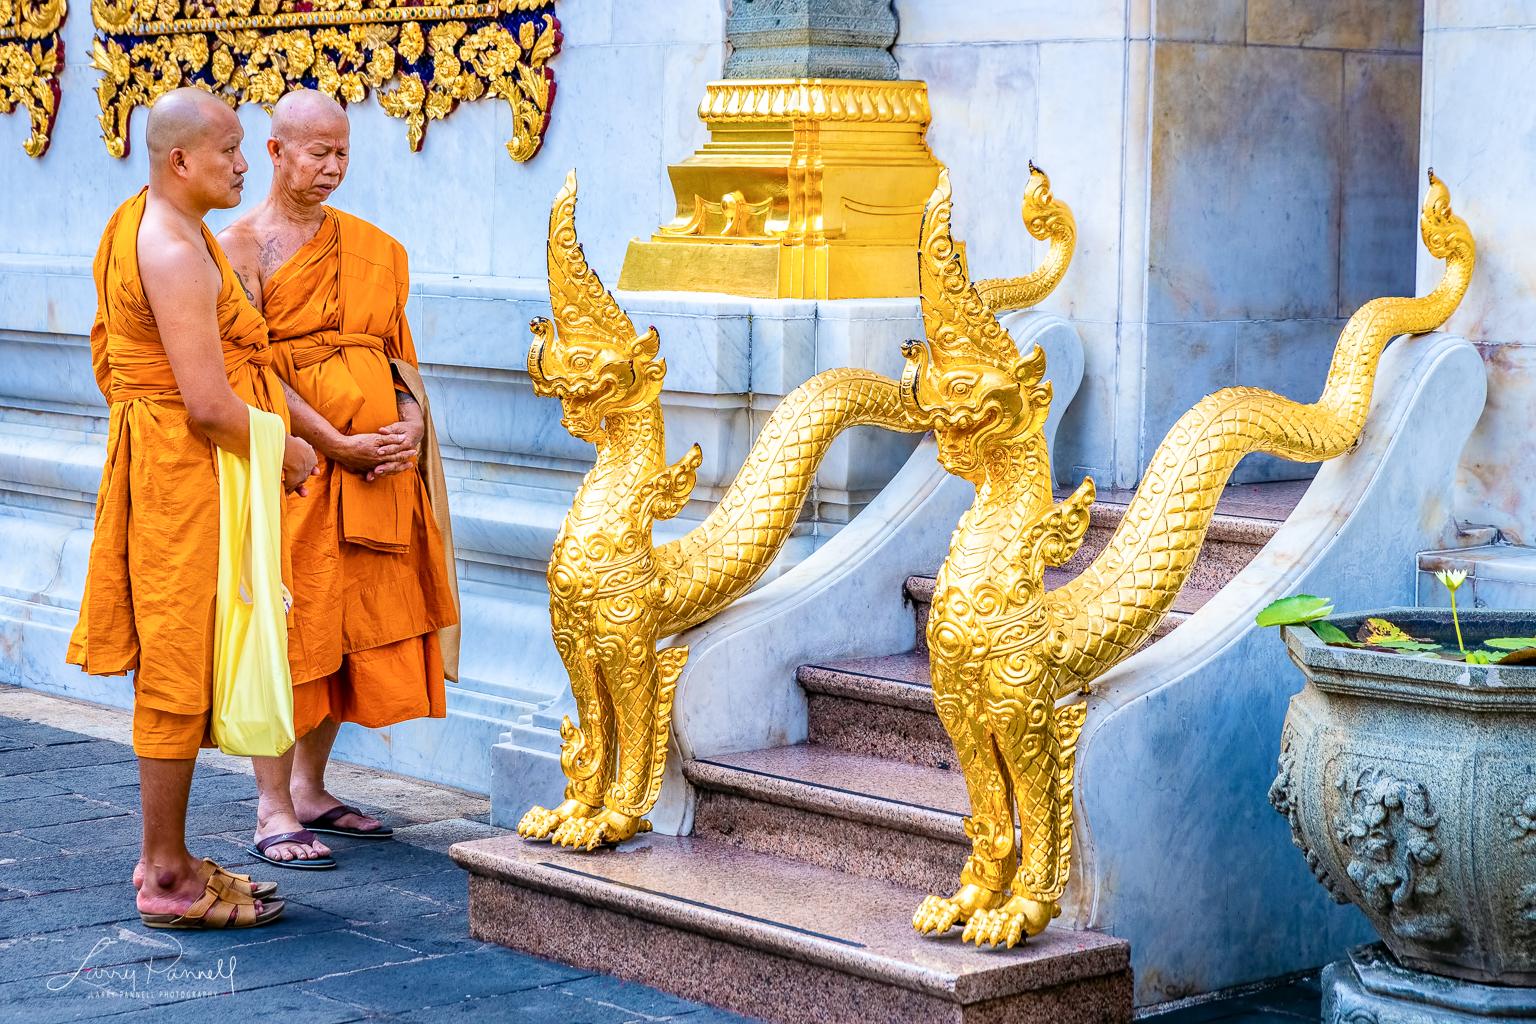 D85_2240-Edit_bangkok two monks